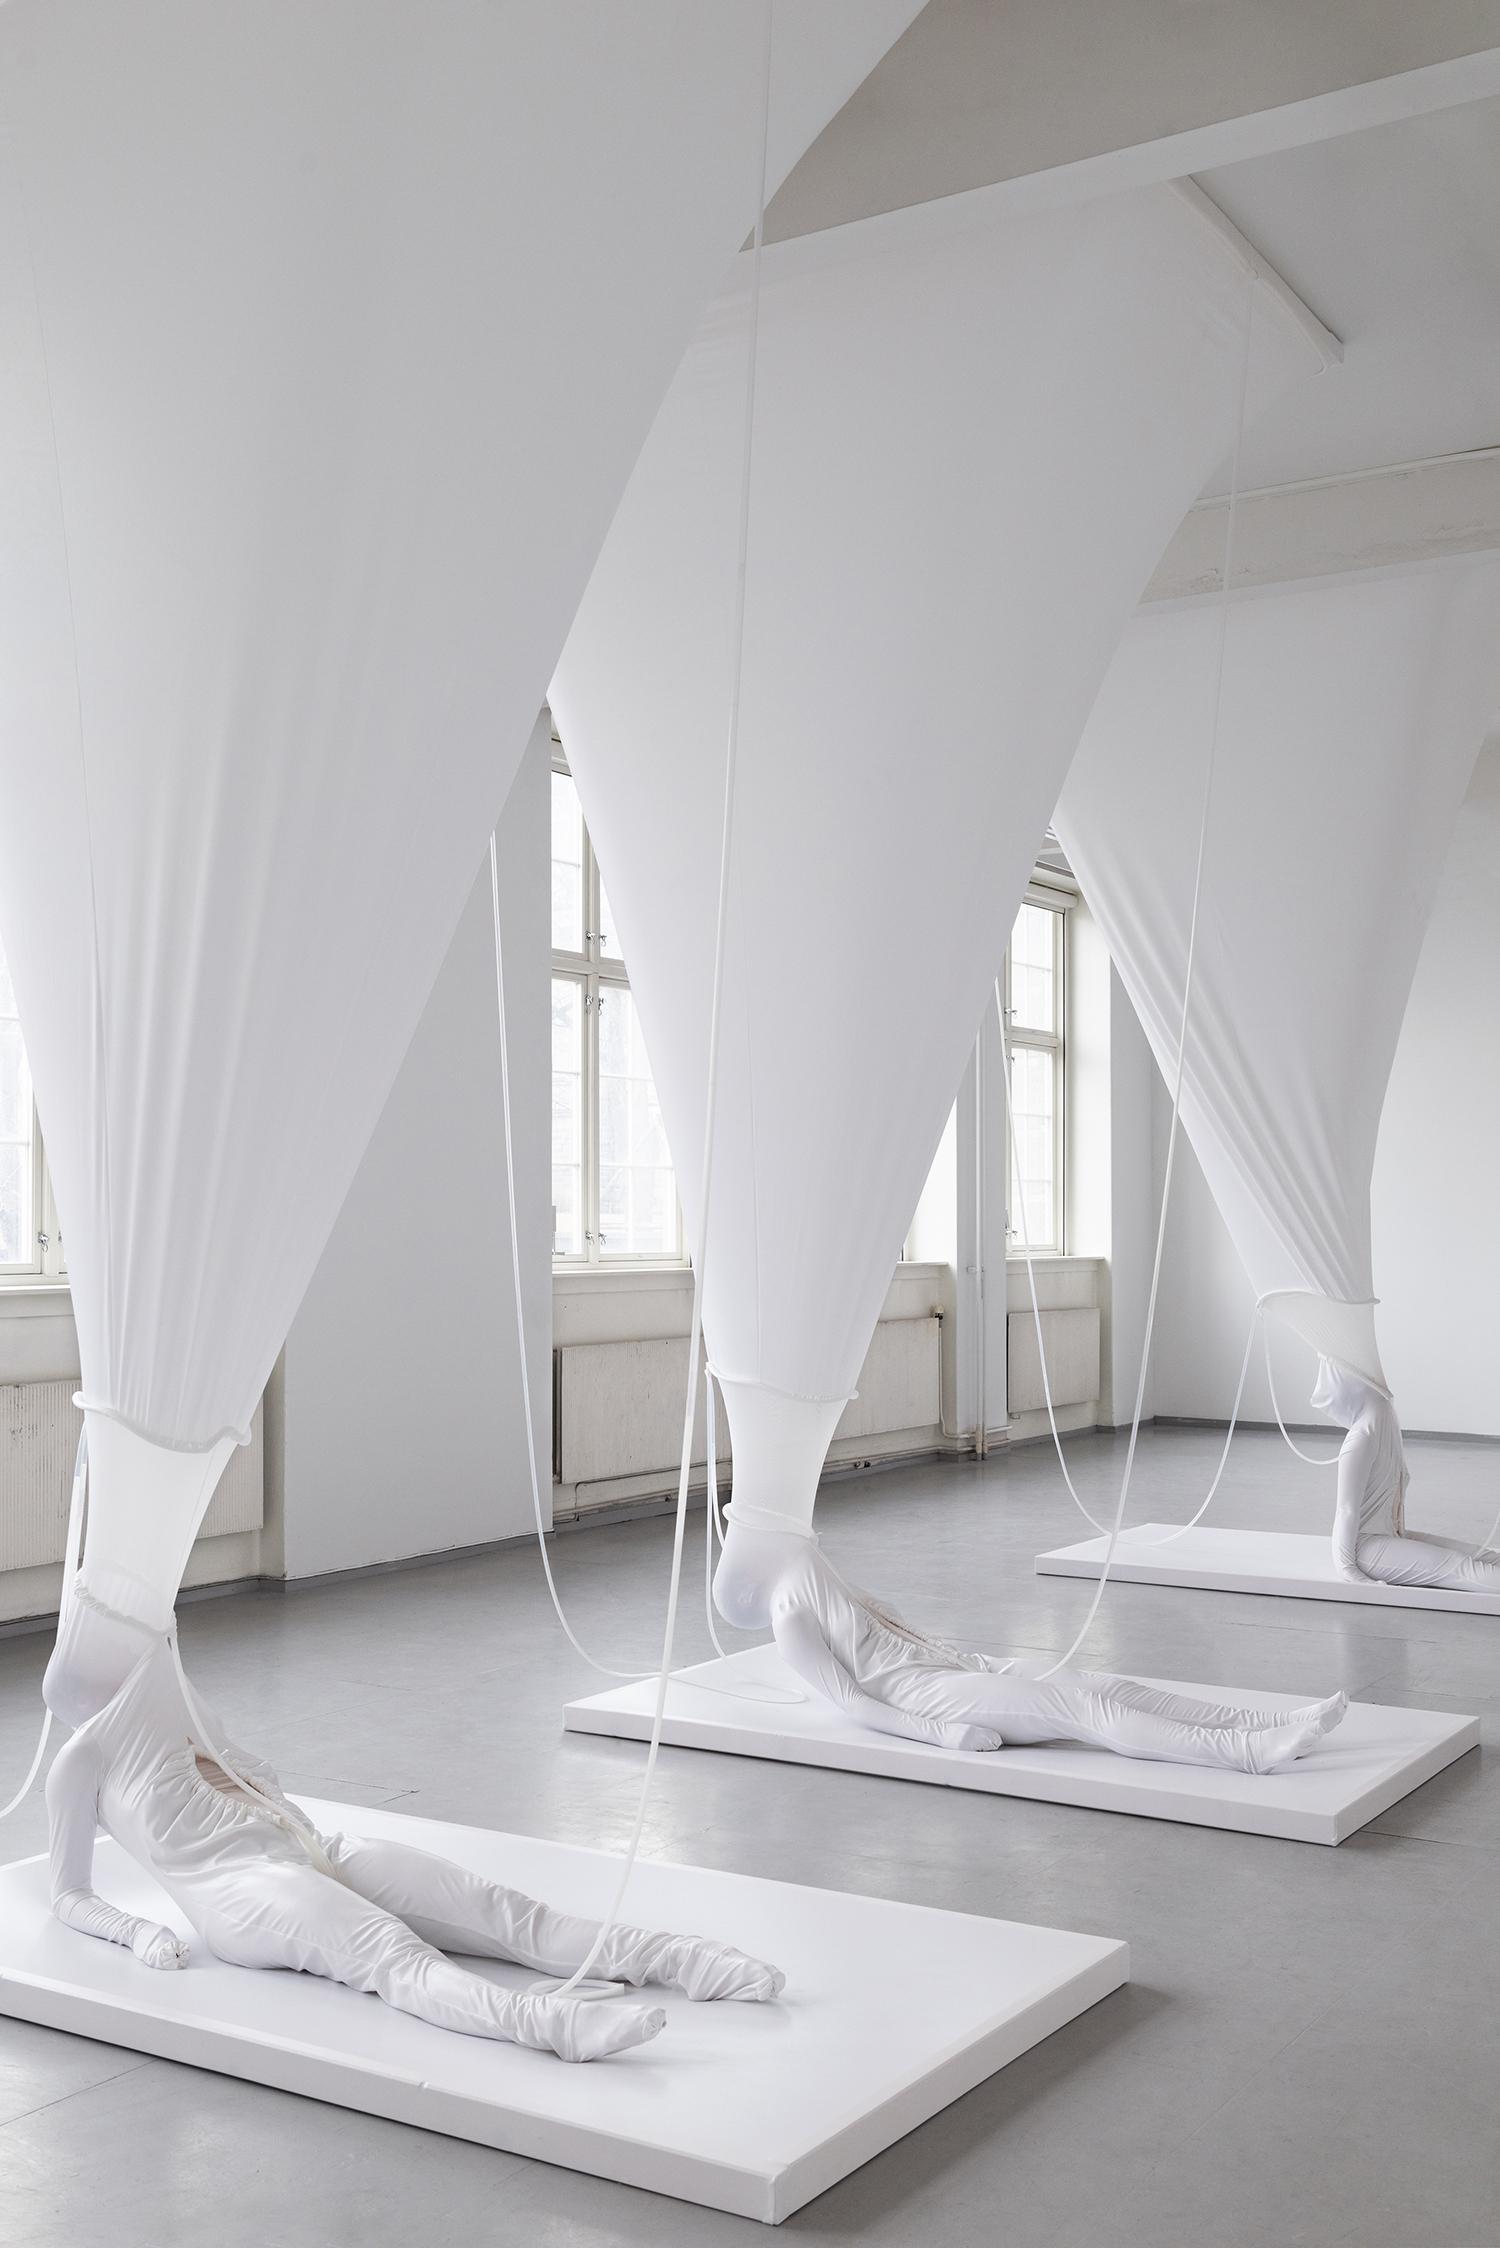 Malin Bulow Mesmerising Performance Art Elastic Bonding 1 Yellowtrace 06